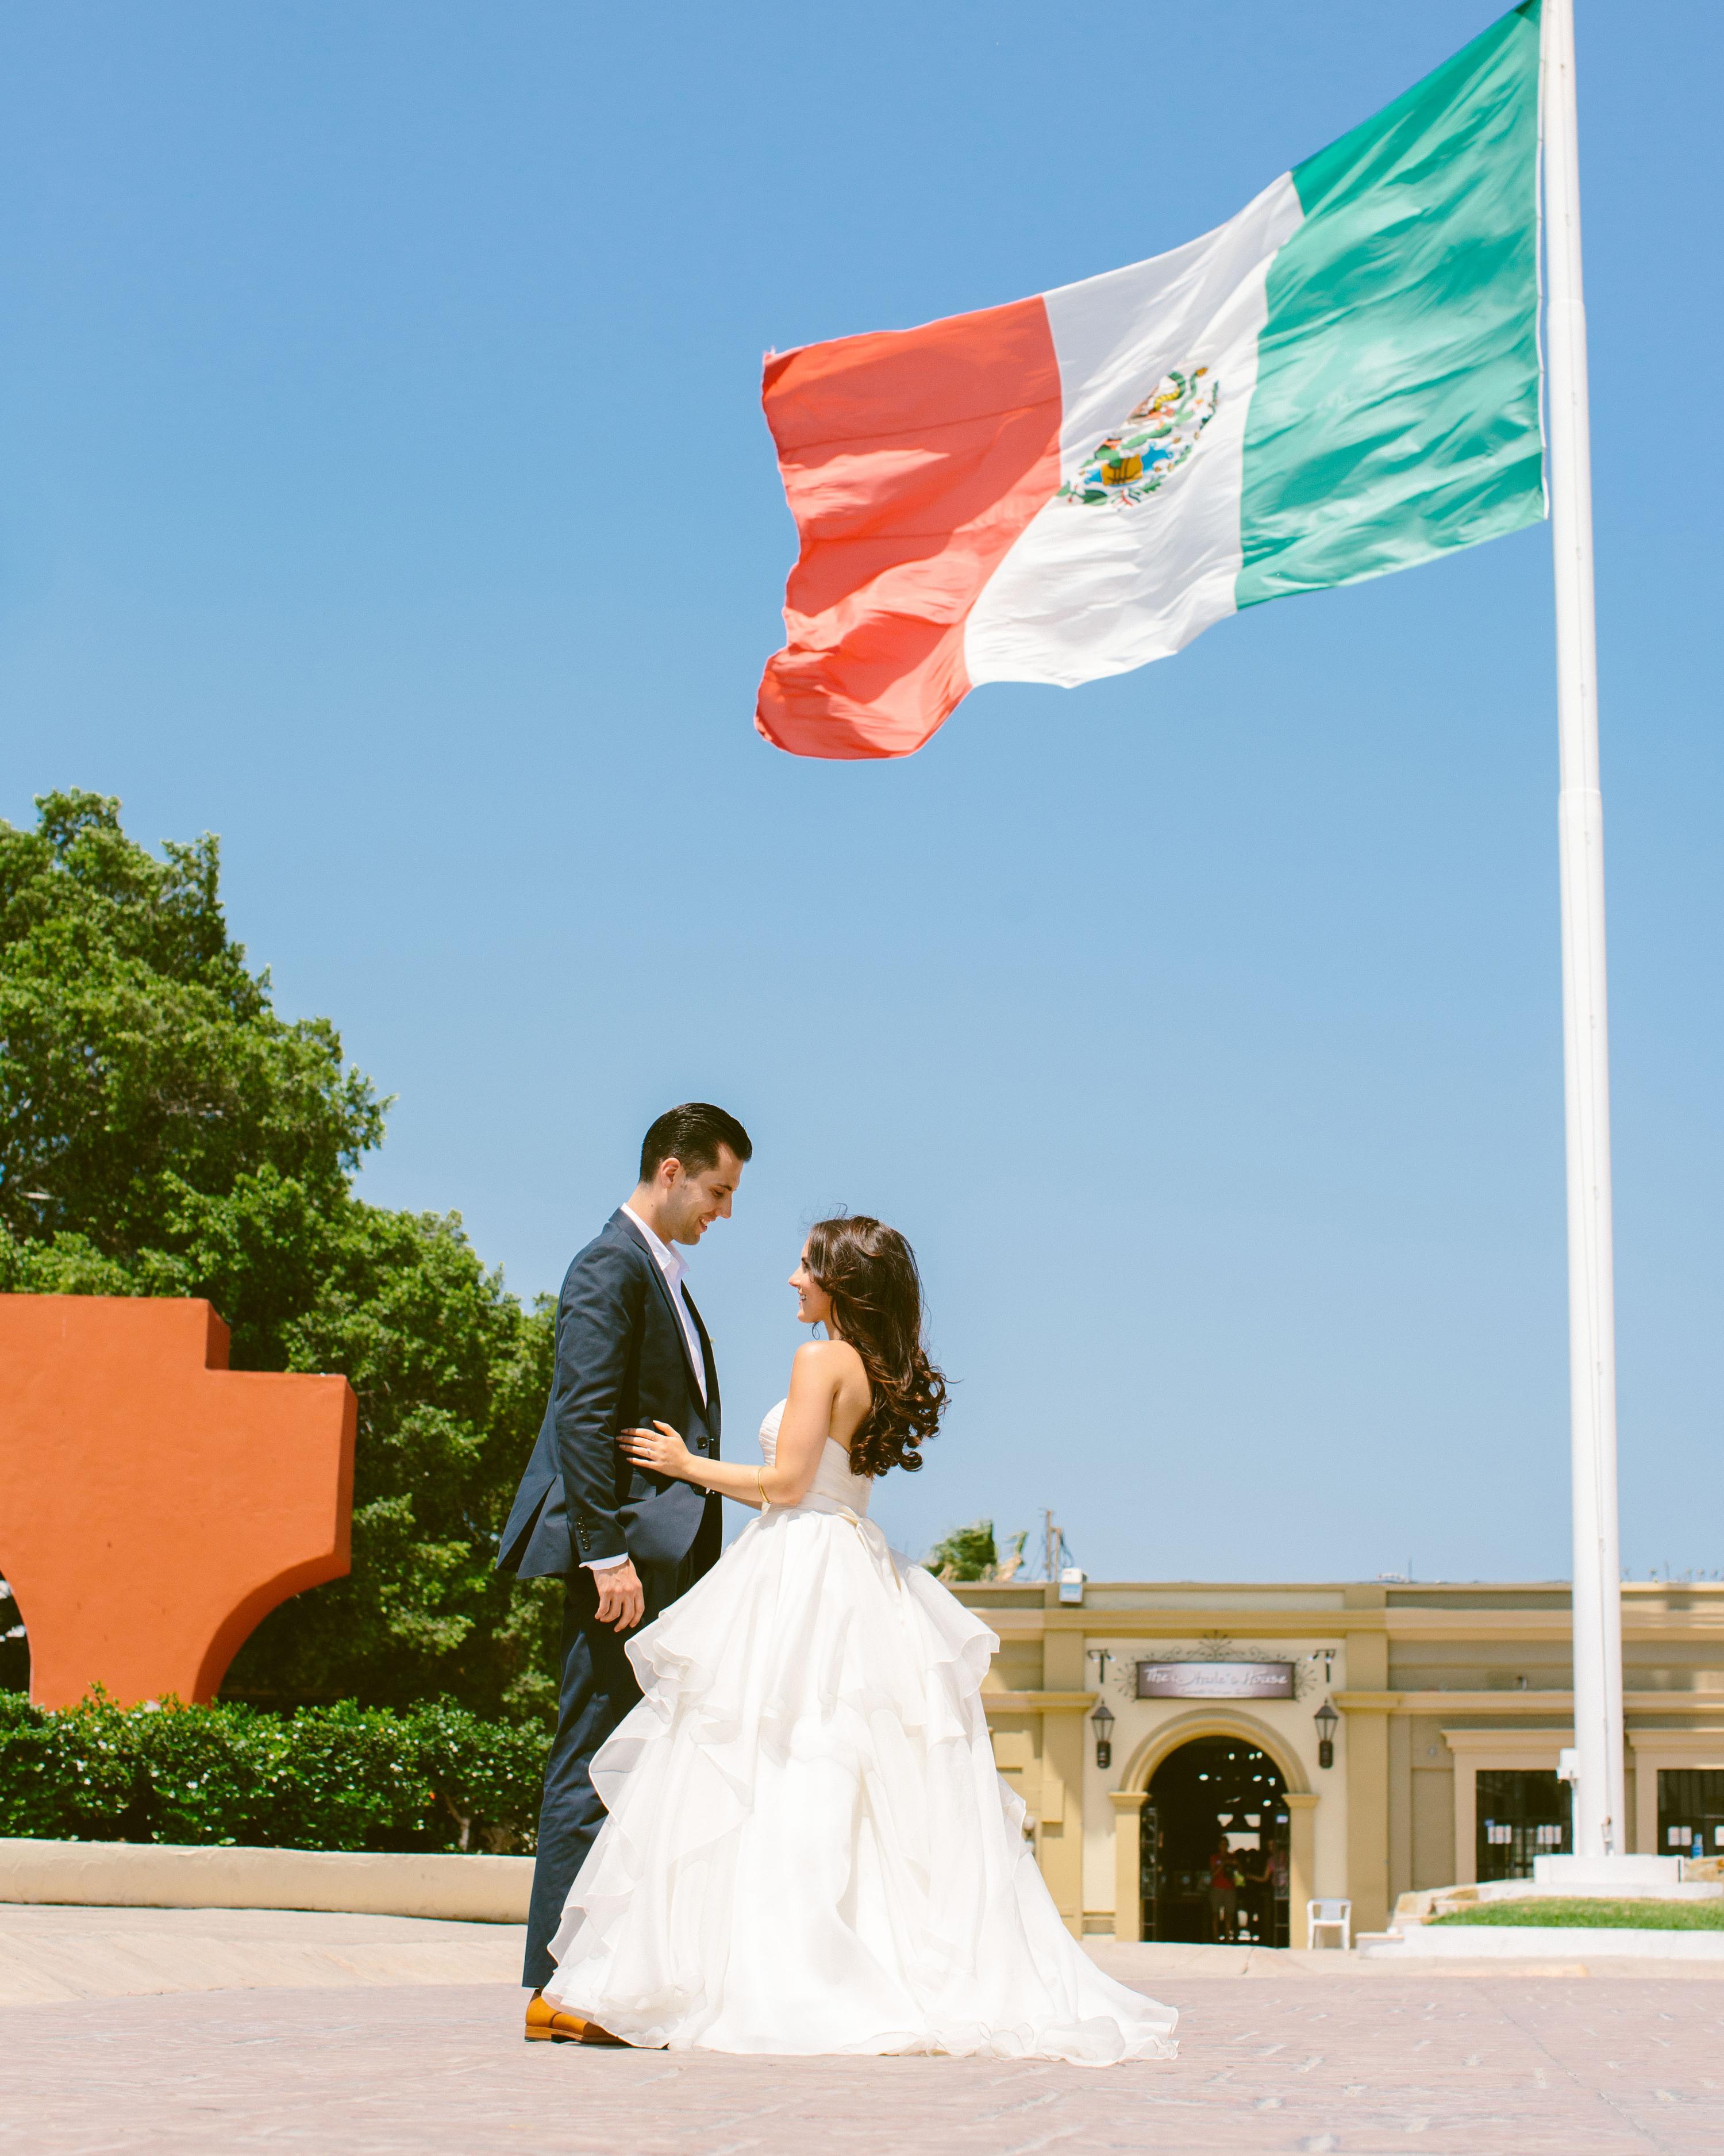 c161426070342 Ali and Jess's Intimate Cabo Wedding | Martha Stewart Weddings